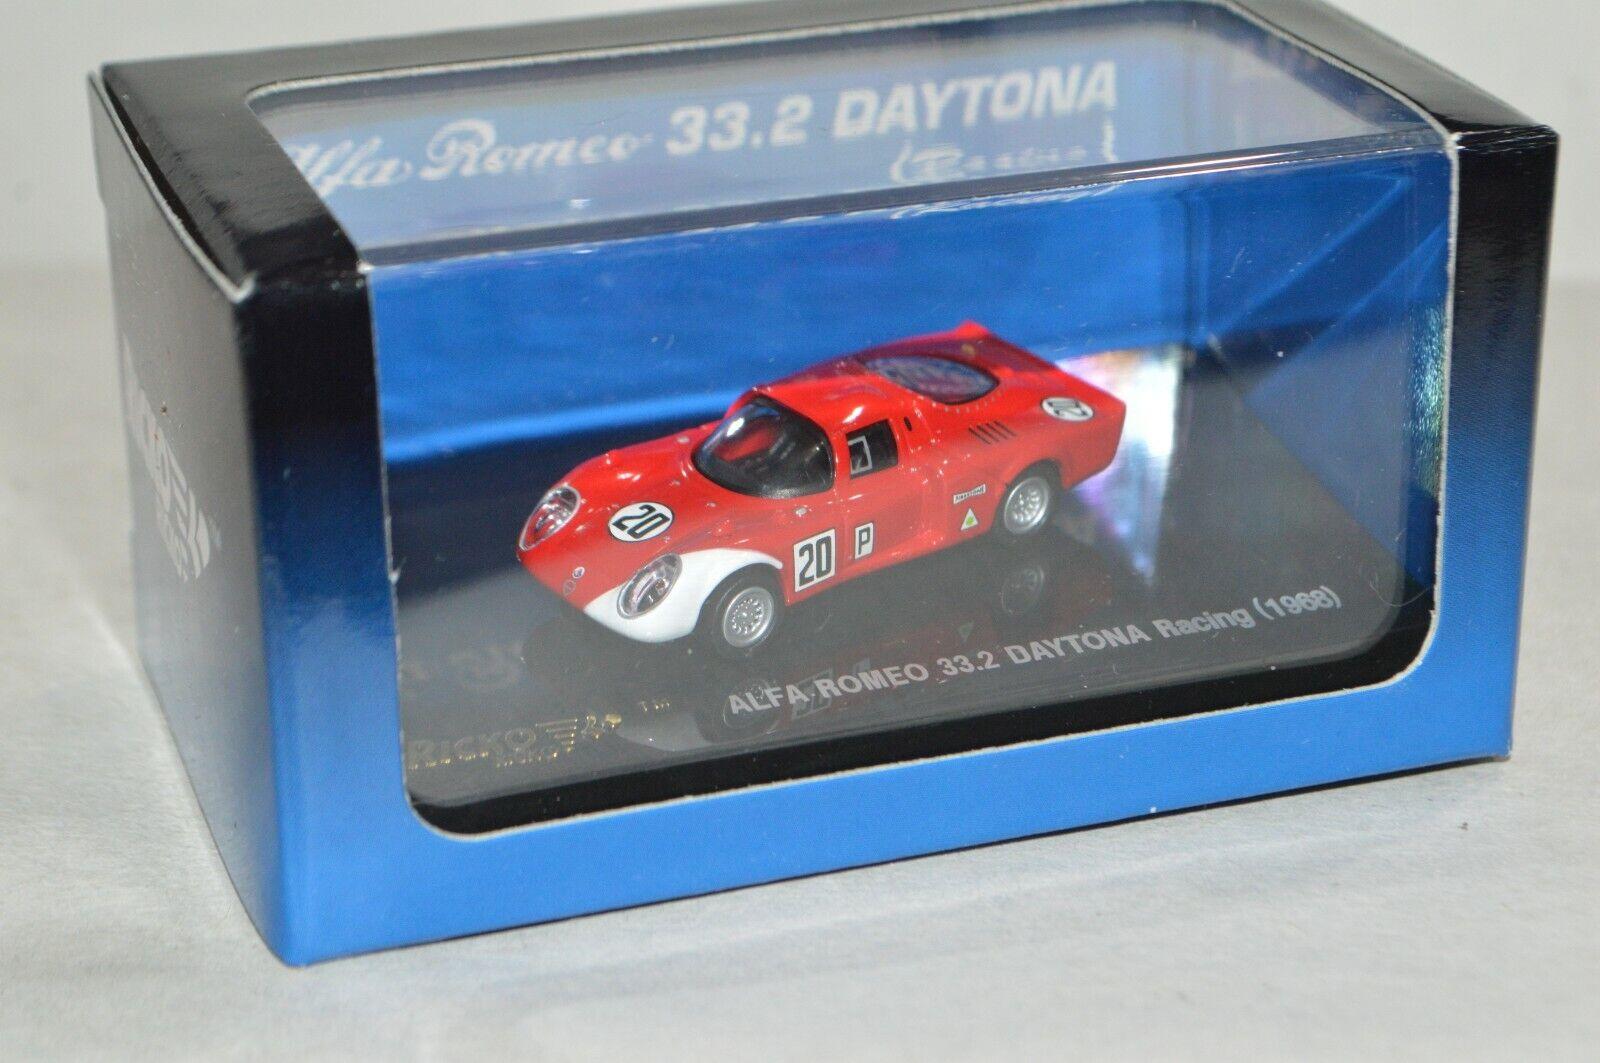 HO scale Ricko Alfa Romeo 33.2 Daytona Racing 1968 car auto automobile